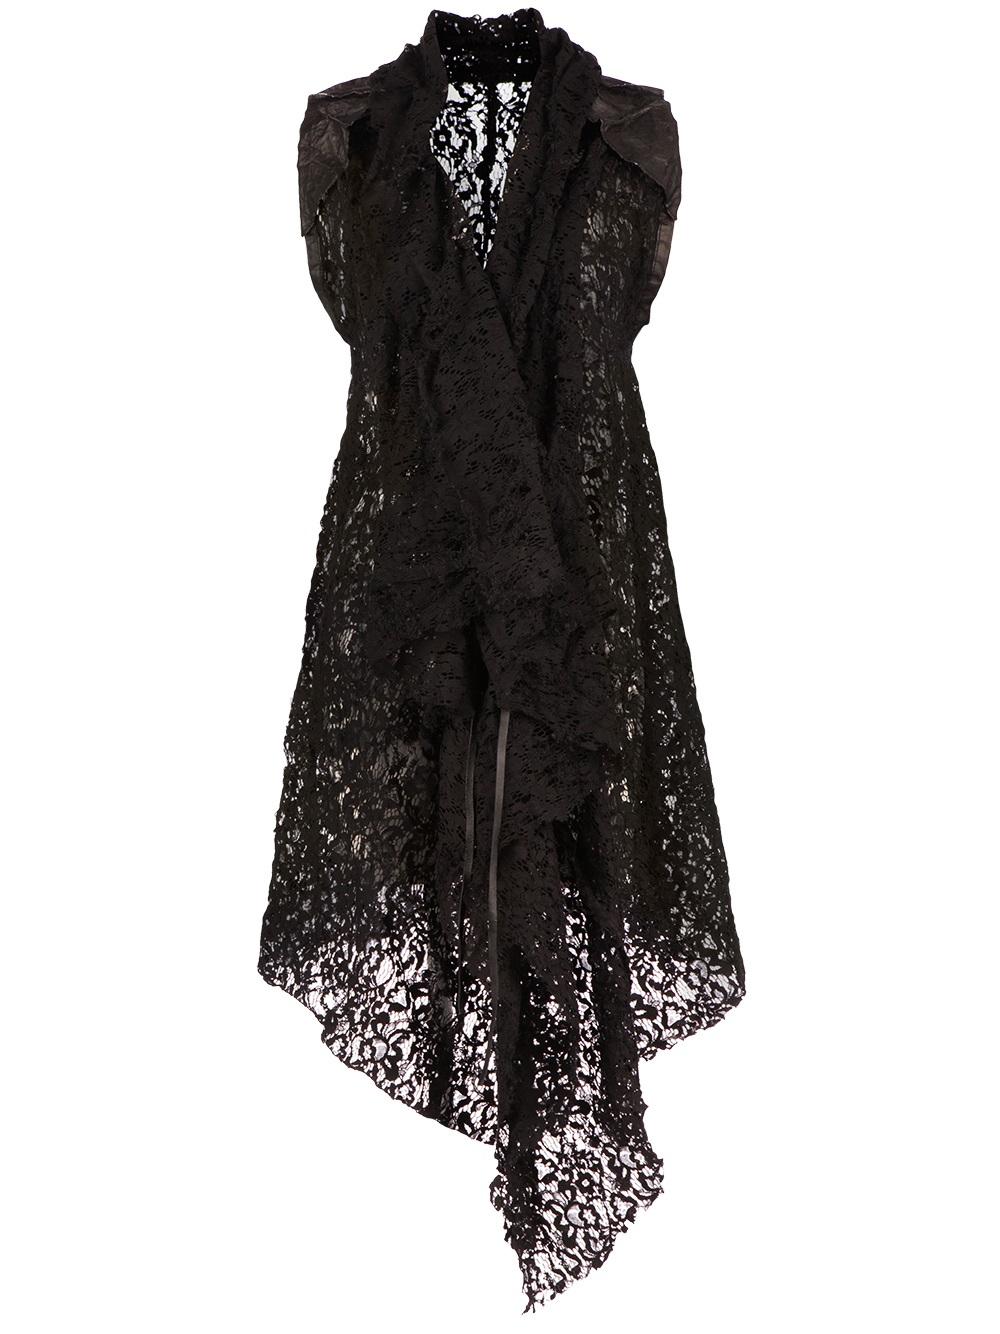 Simona tagliaferri Layered Floral Lace Cardigan in Black | Lyst